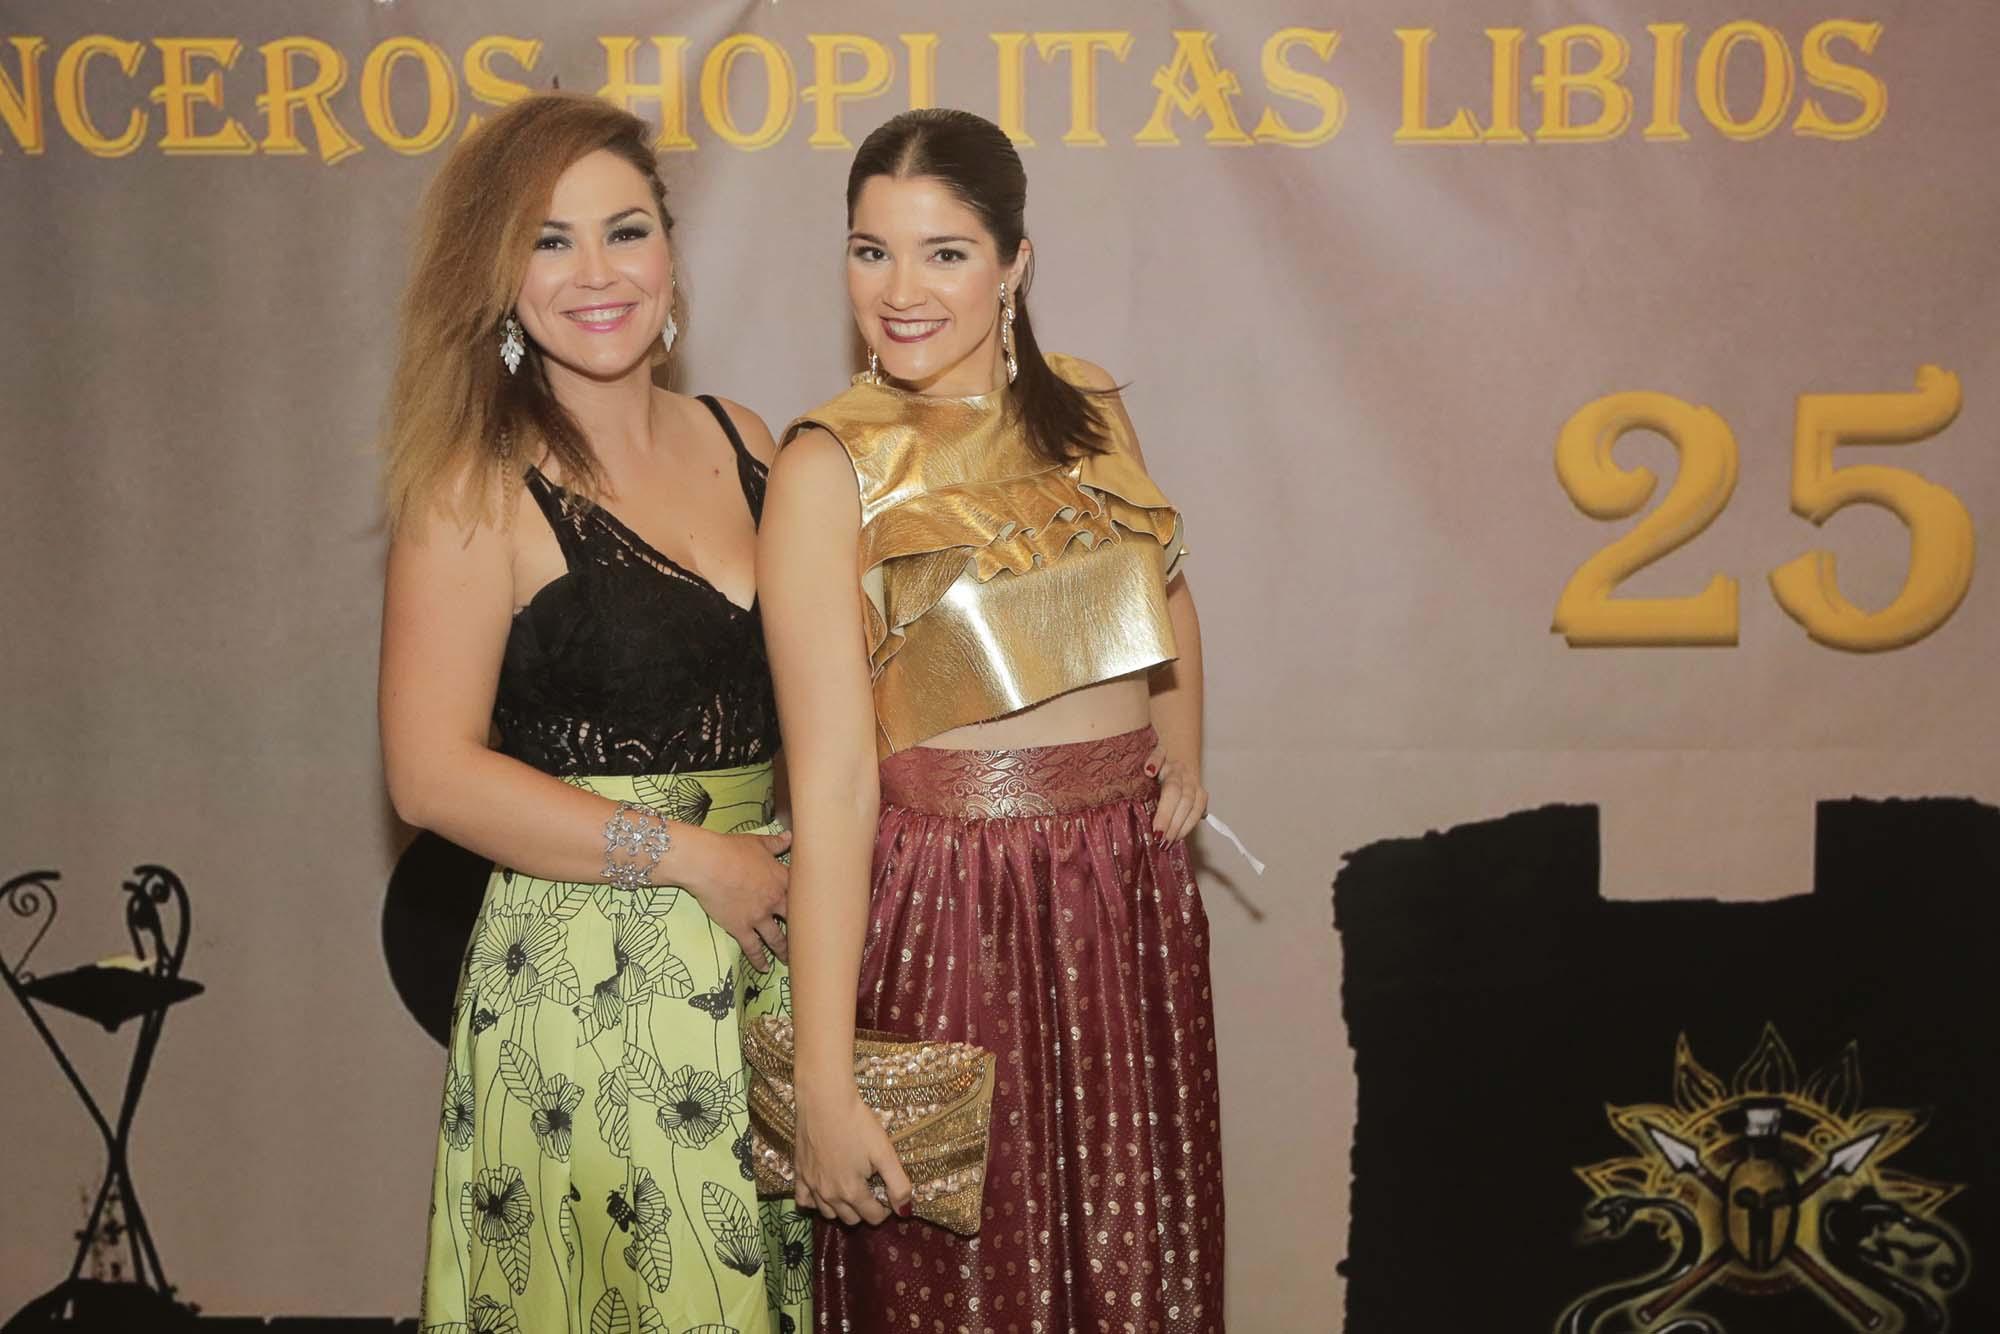 Lanceros Hoplitas Libios  (204)